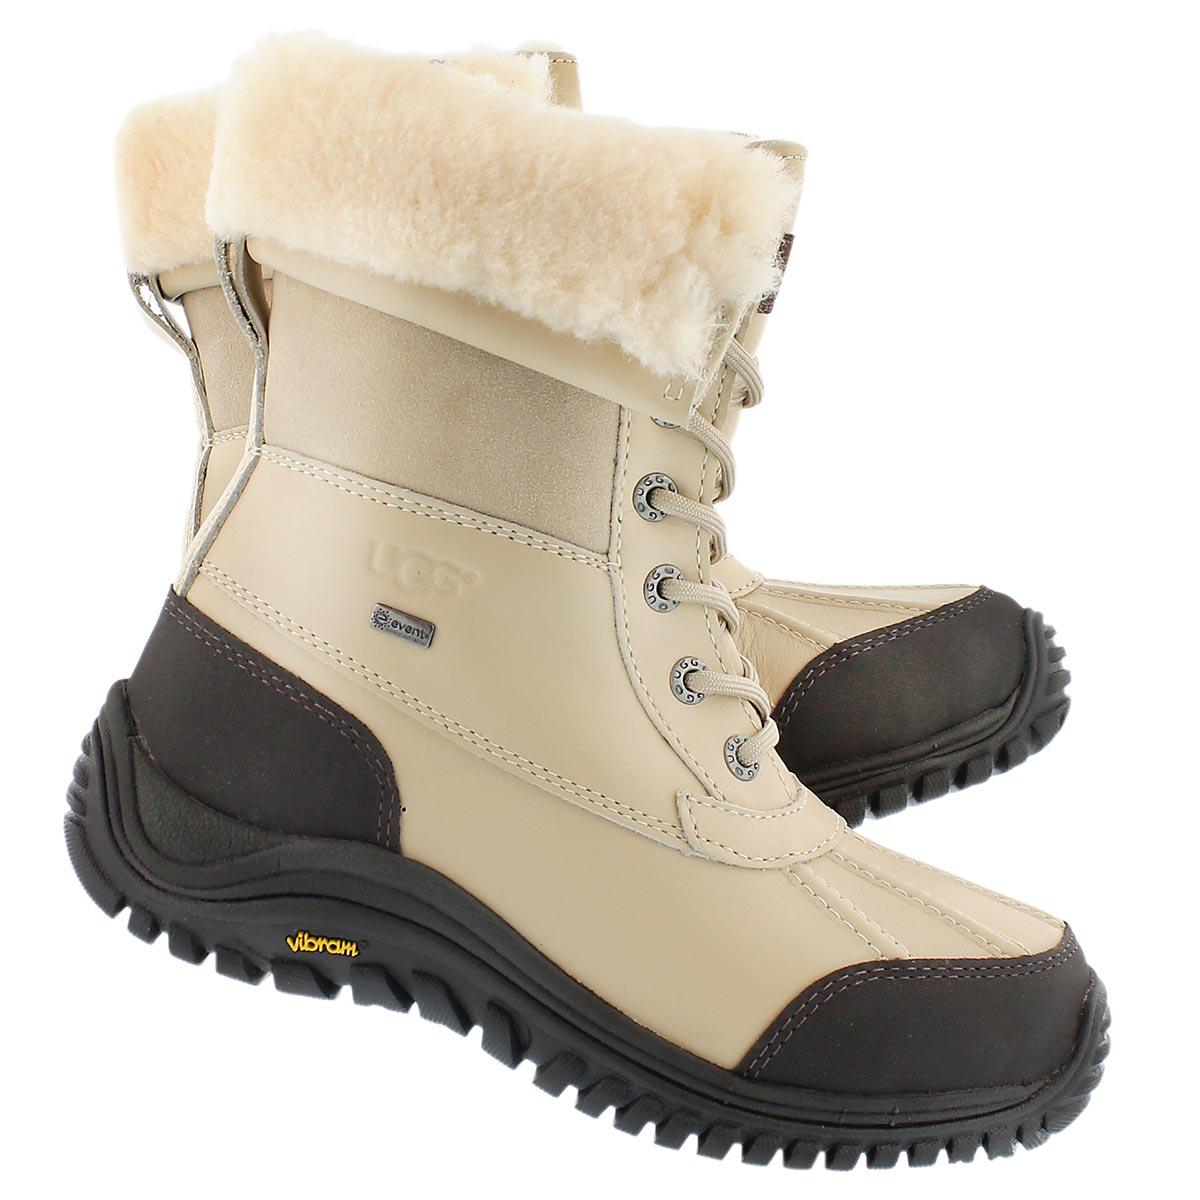 Lds Adirondack II sand winter boot